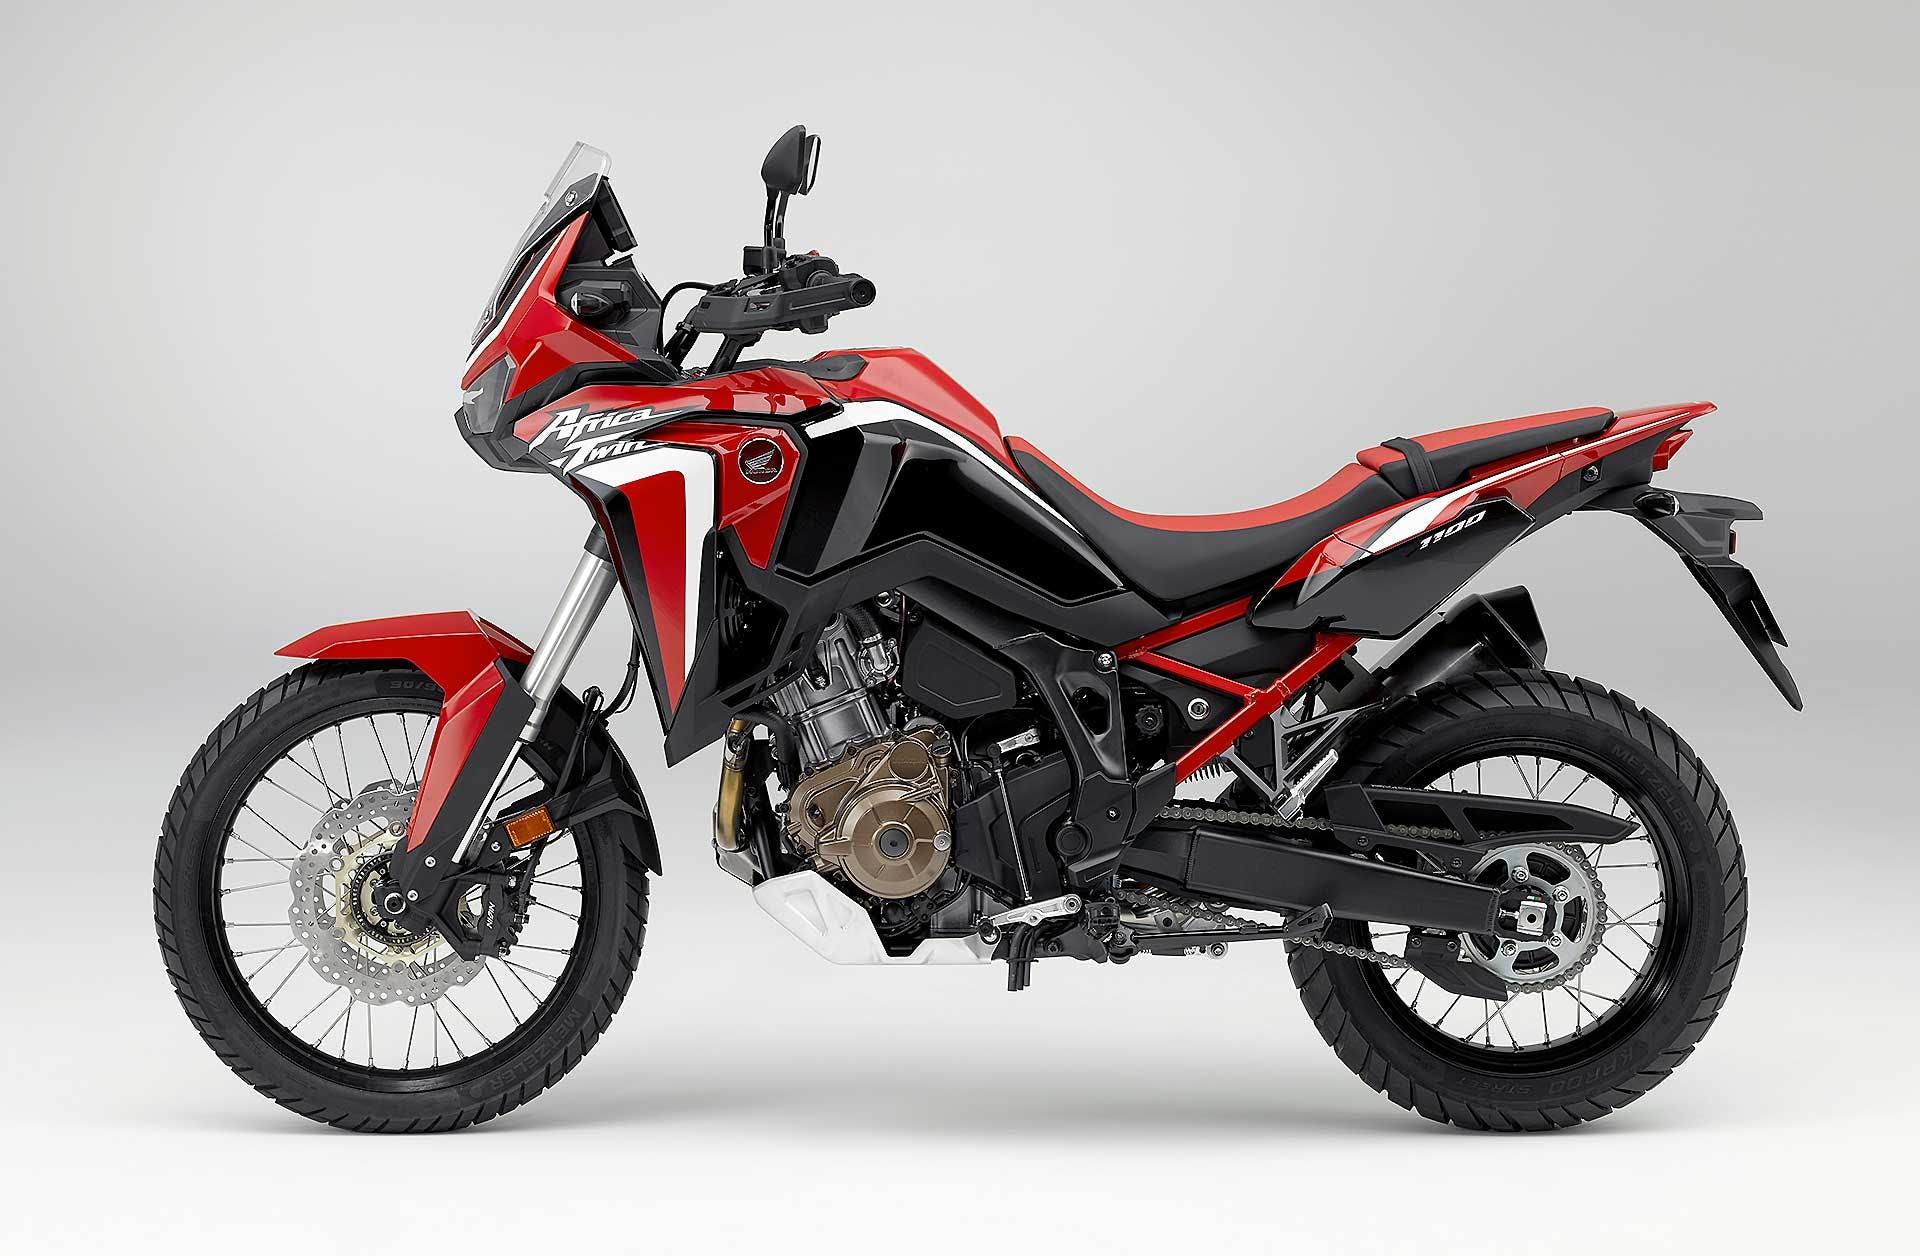 Honda Africa Twin 1100 - Migliori maxi enduro 2021